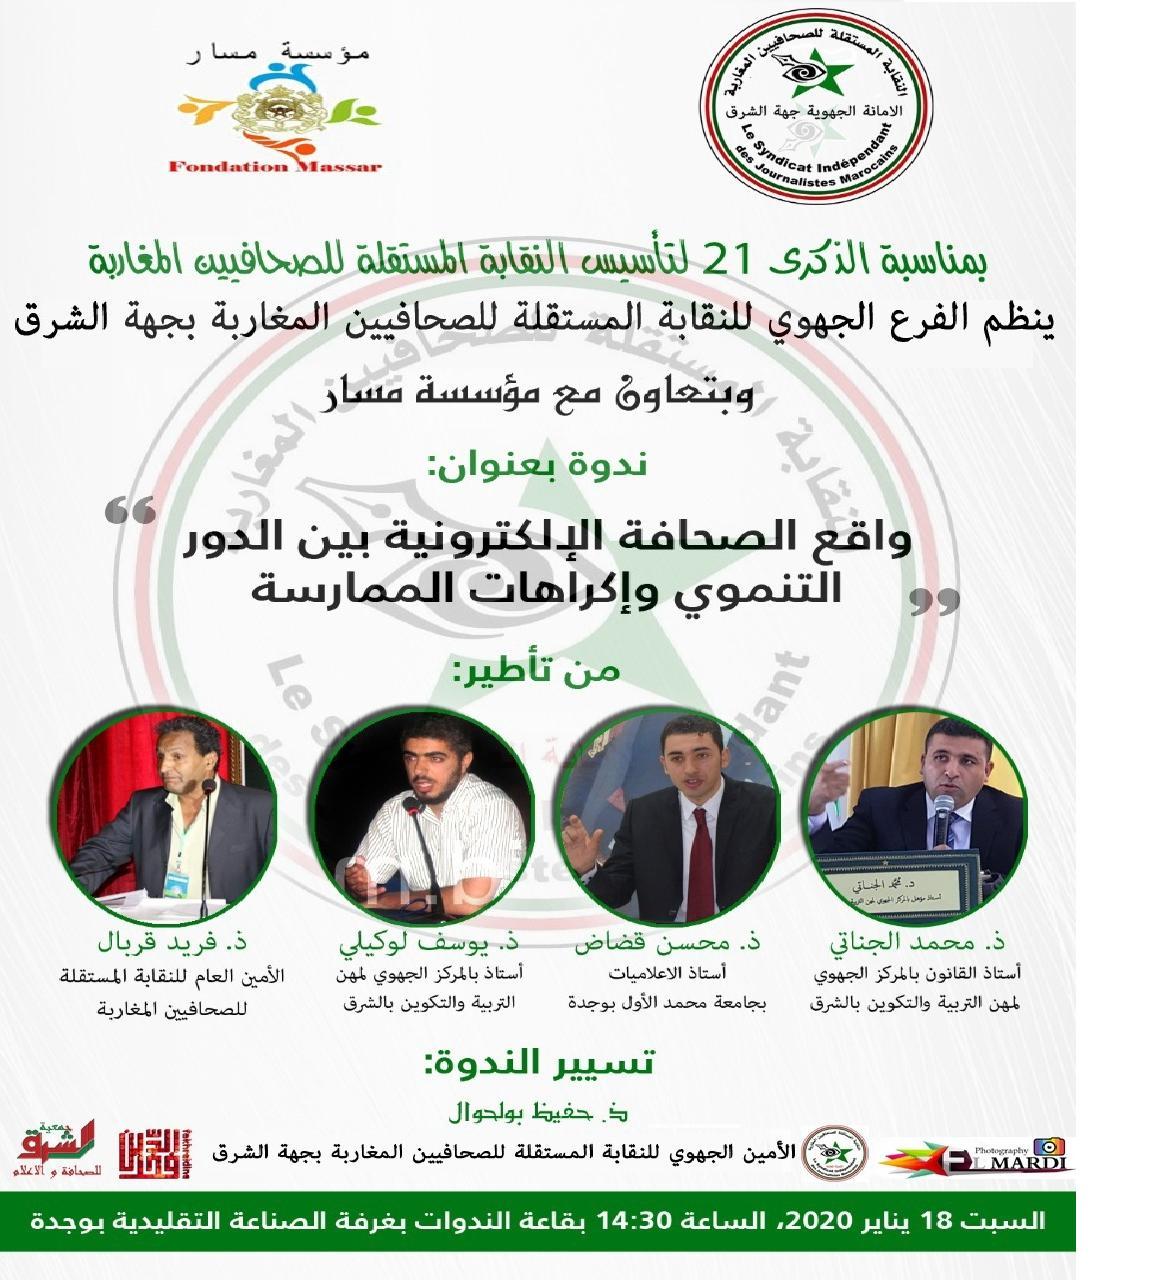 Photo of بلاغ حول تخليد الذكرى 21 لتأسيس النقابة المستقلة للصحافيين المغاربة